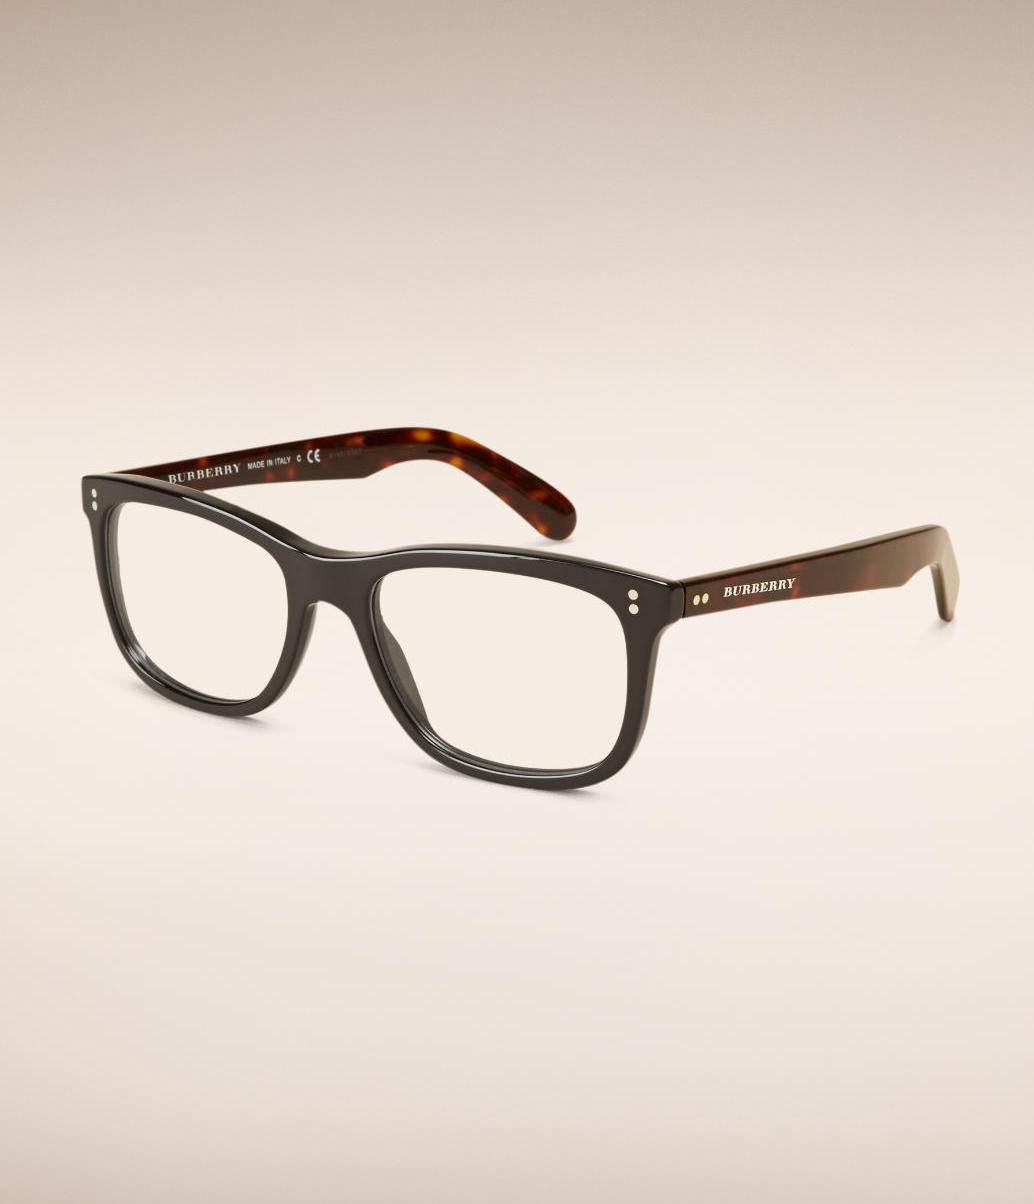 stylish frames, glasses, eyewear, burberry, burberry glasses, menswear, men's style, men's fashion, wardrobe essentials, summer, forties, summer essentials, summer style, fifties, 50s style essentials